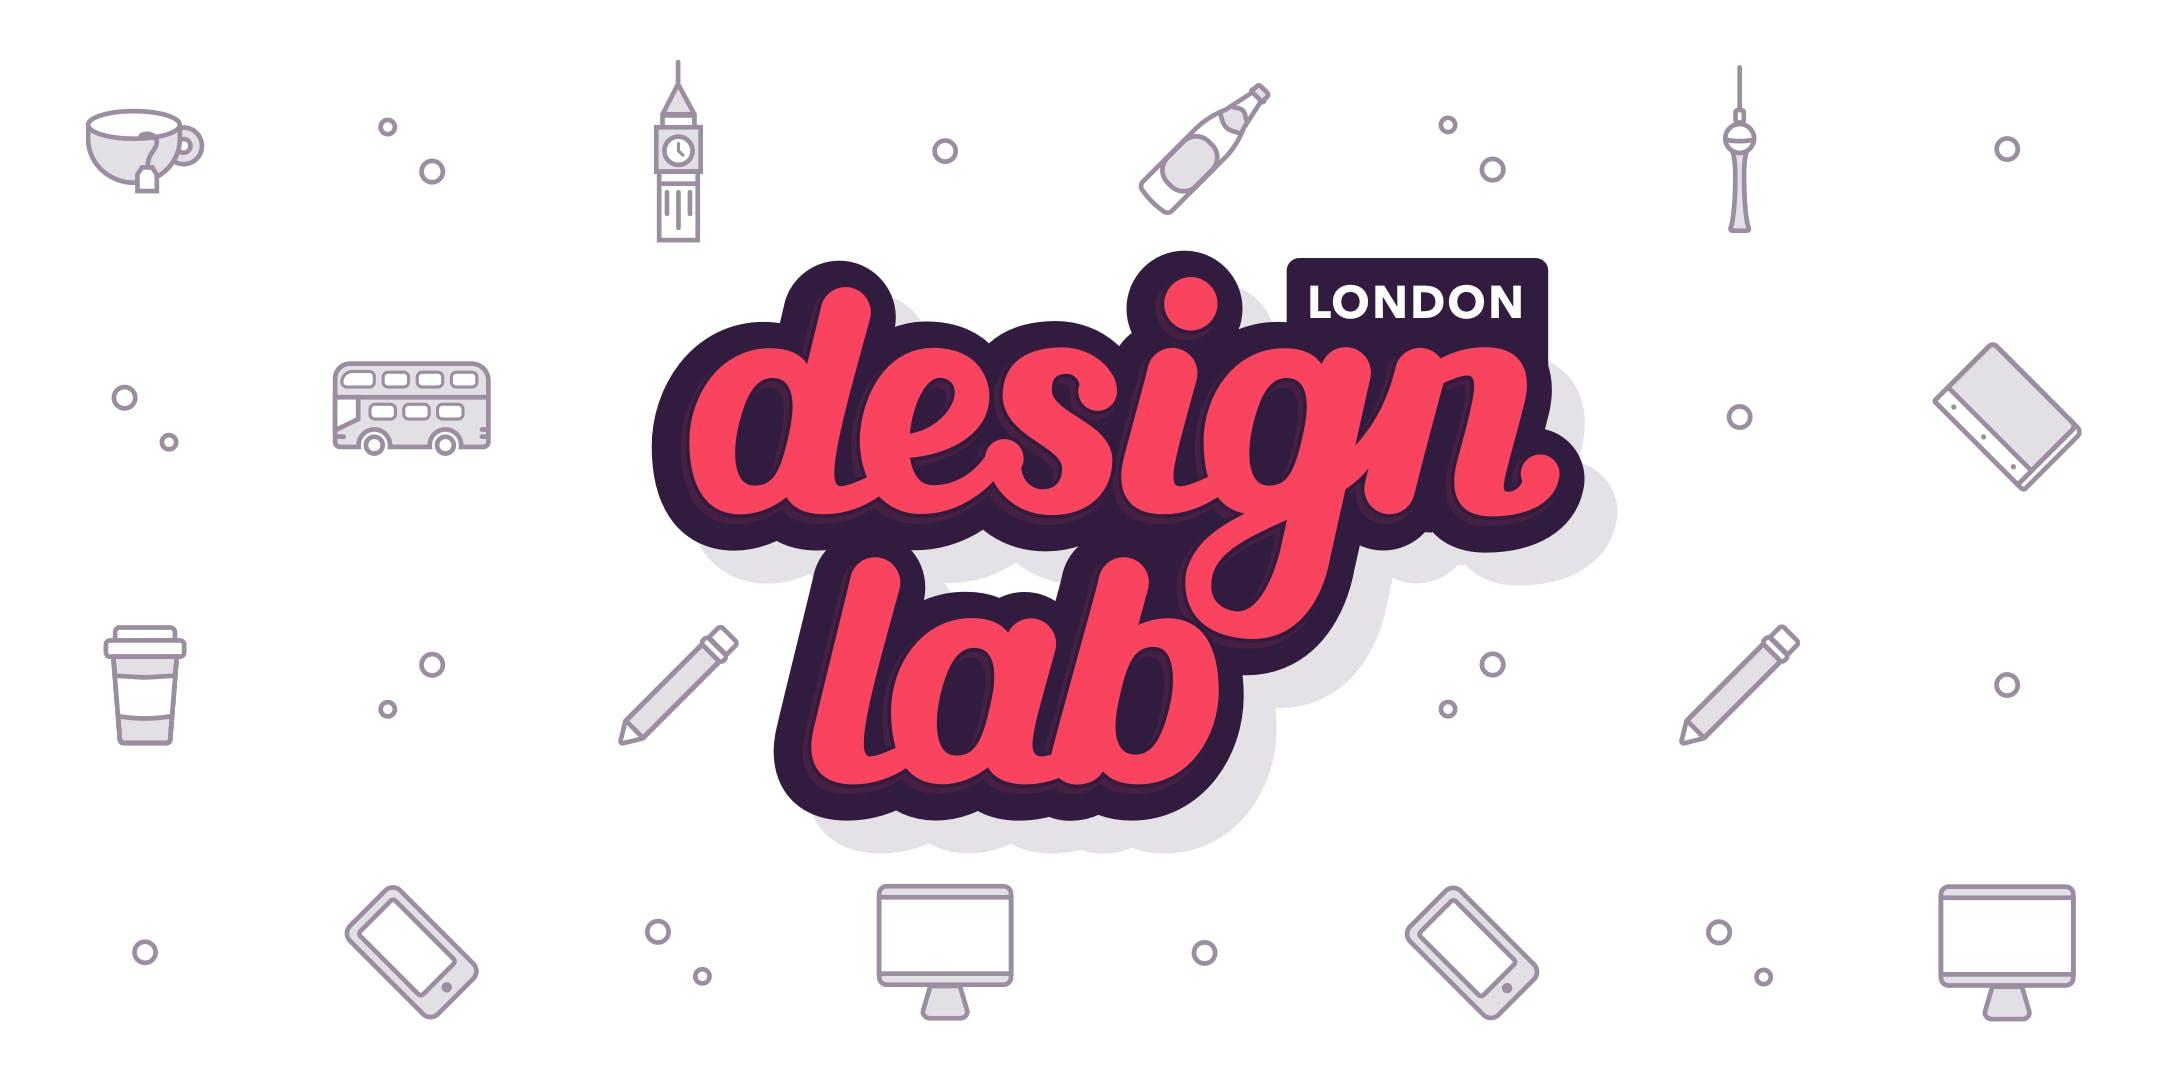 June design lab - London